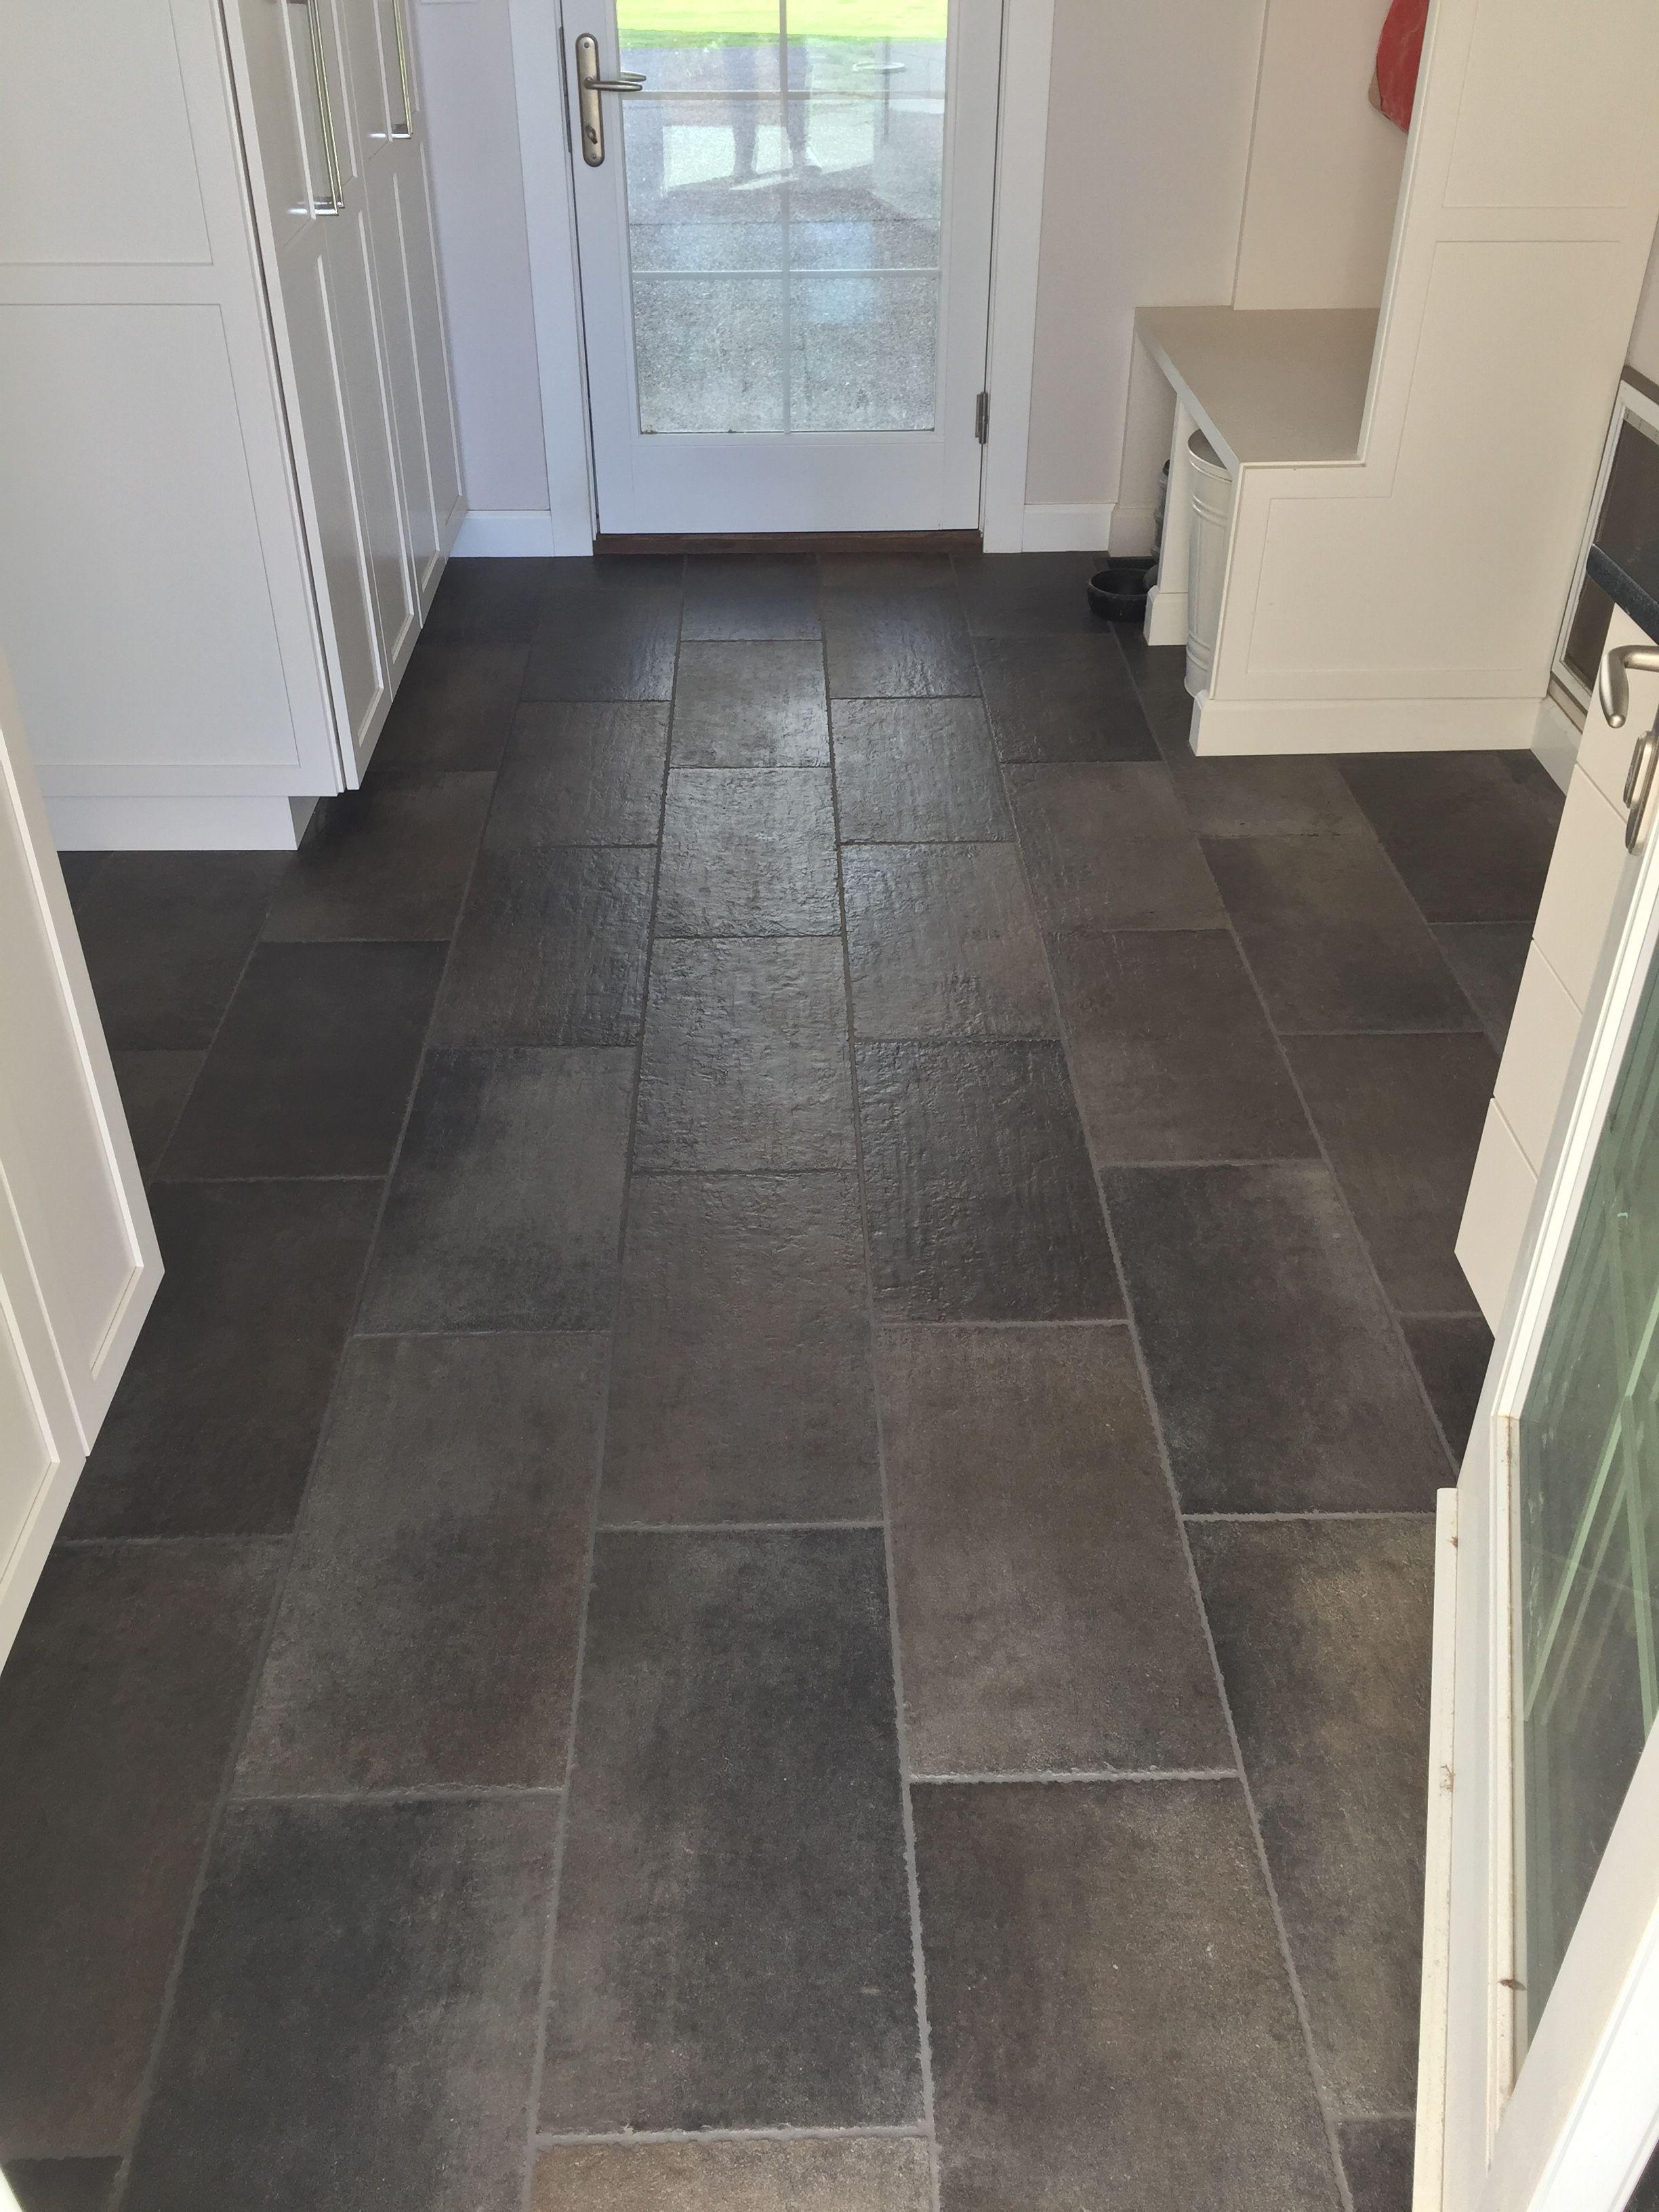 White And Grey Mudroom Large Dark Grey 12x24 Tiled Floor